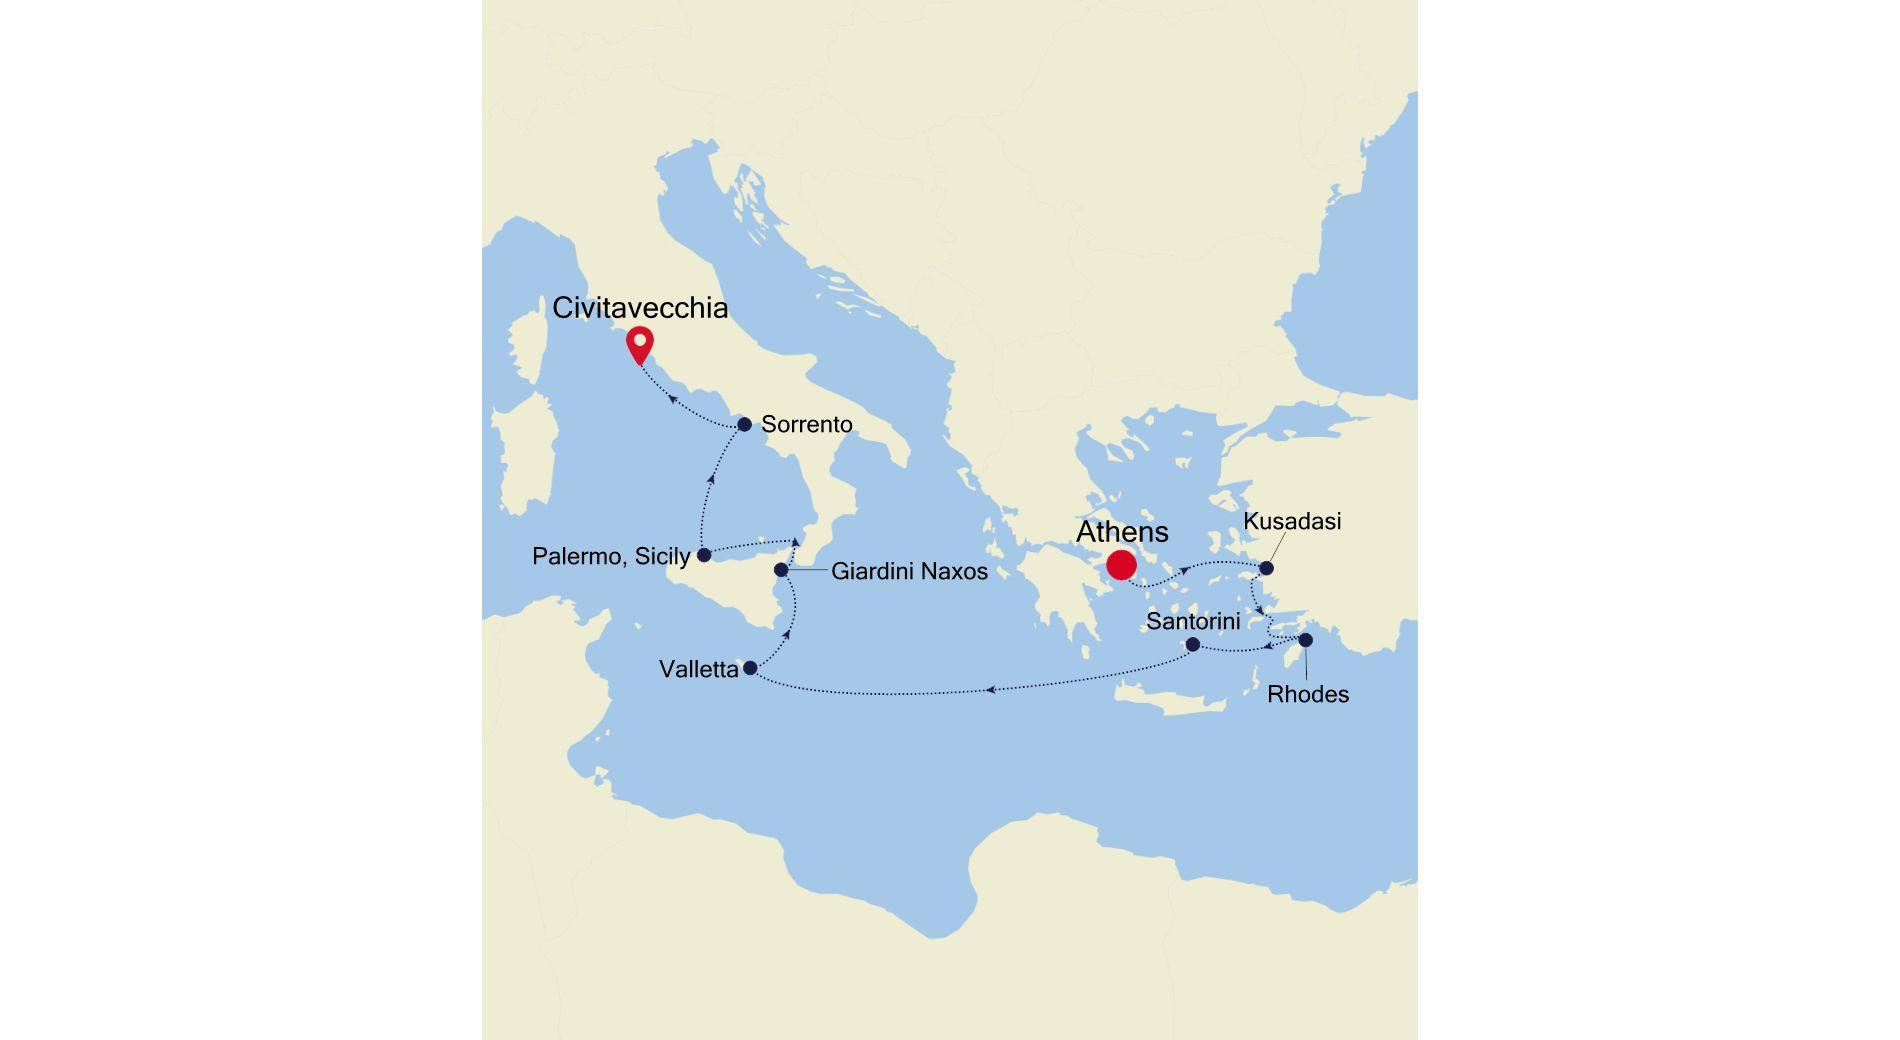 DA211020010 - Athens nach Civitavecchia